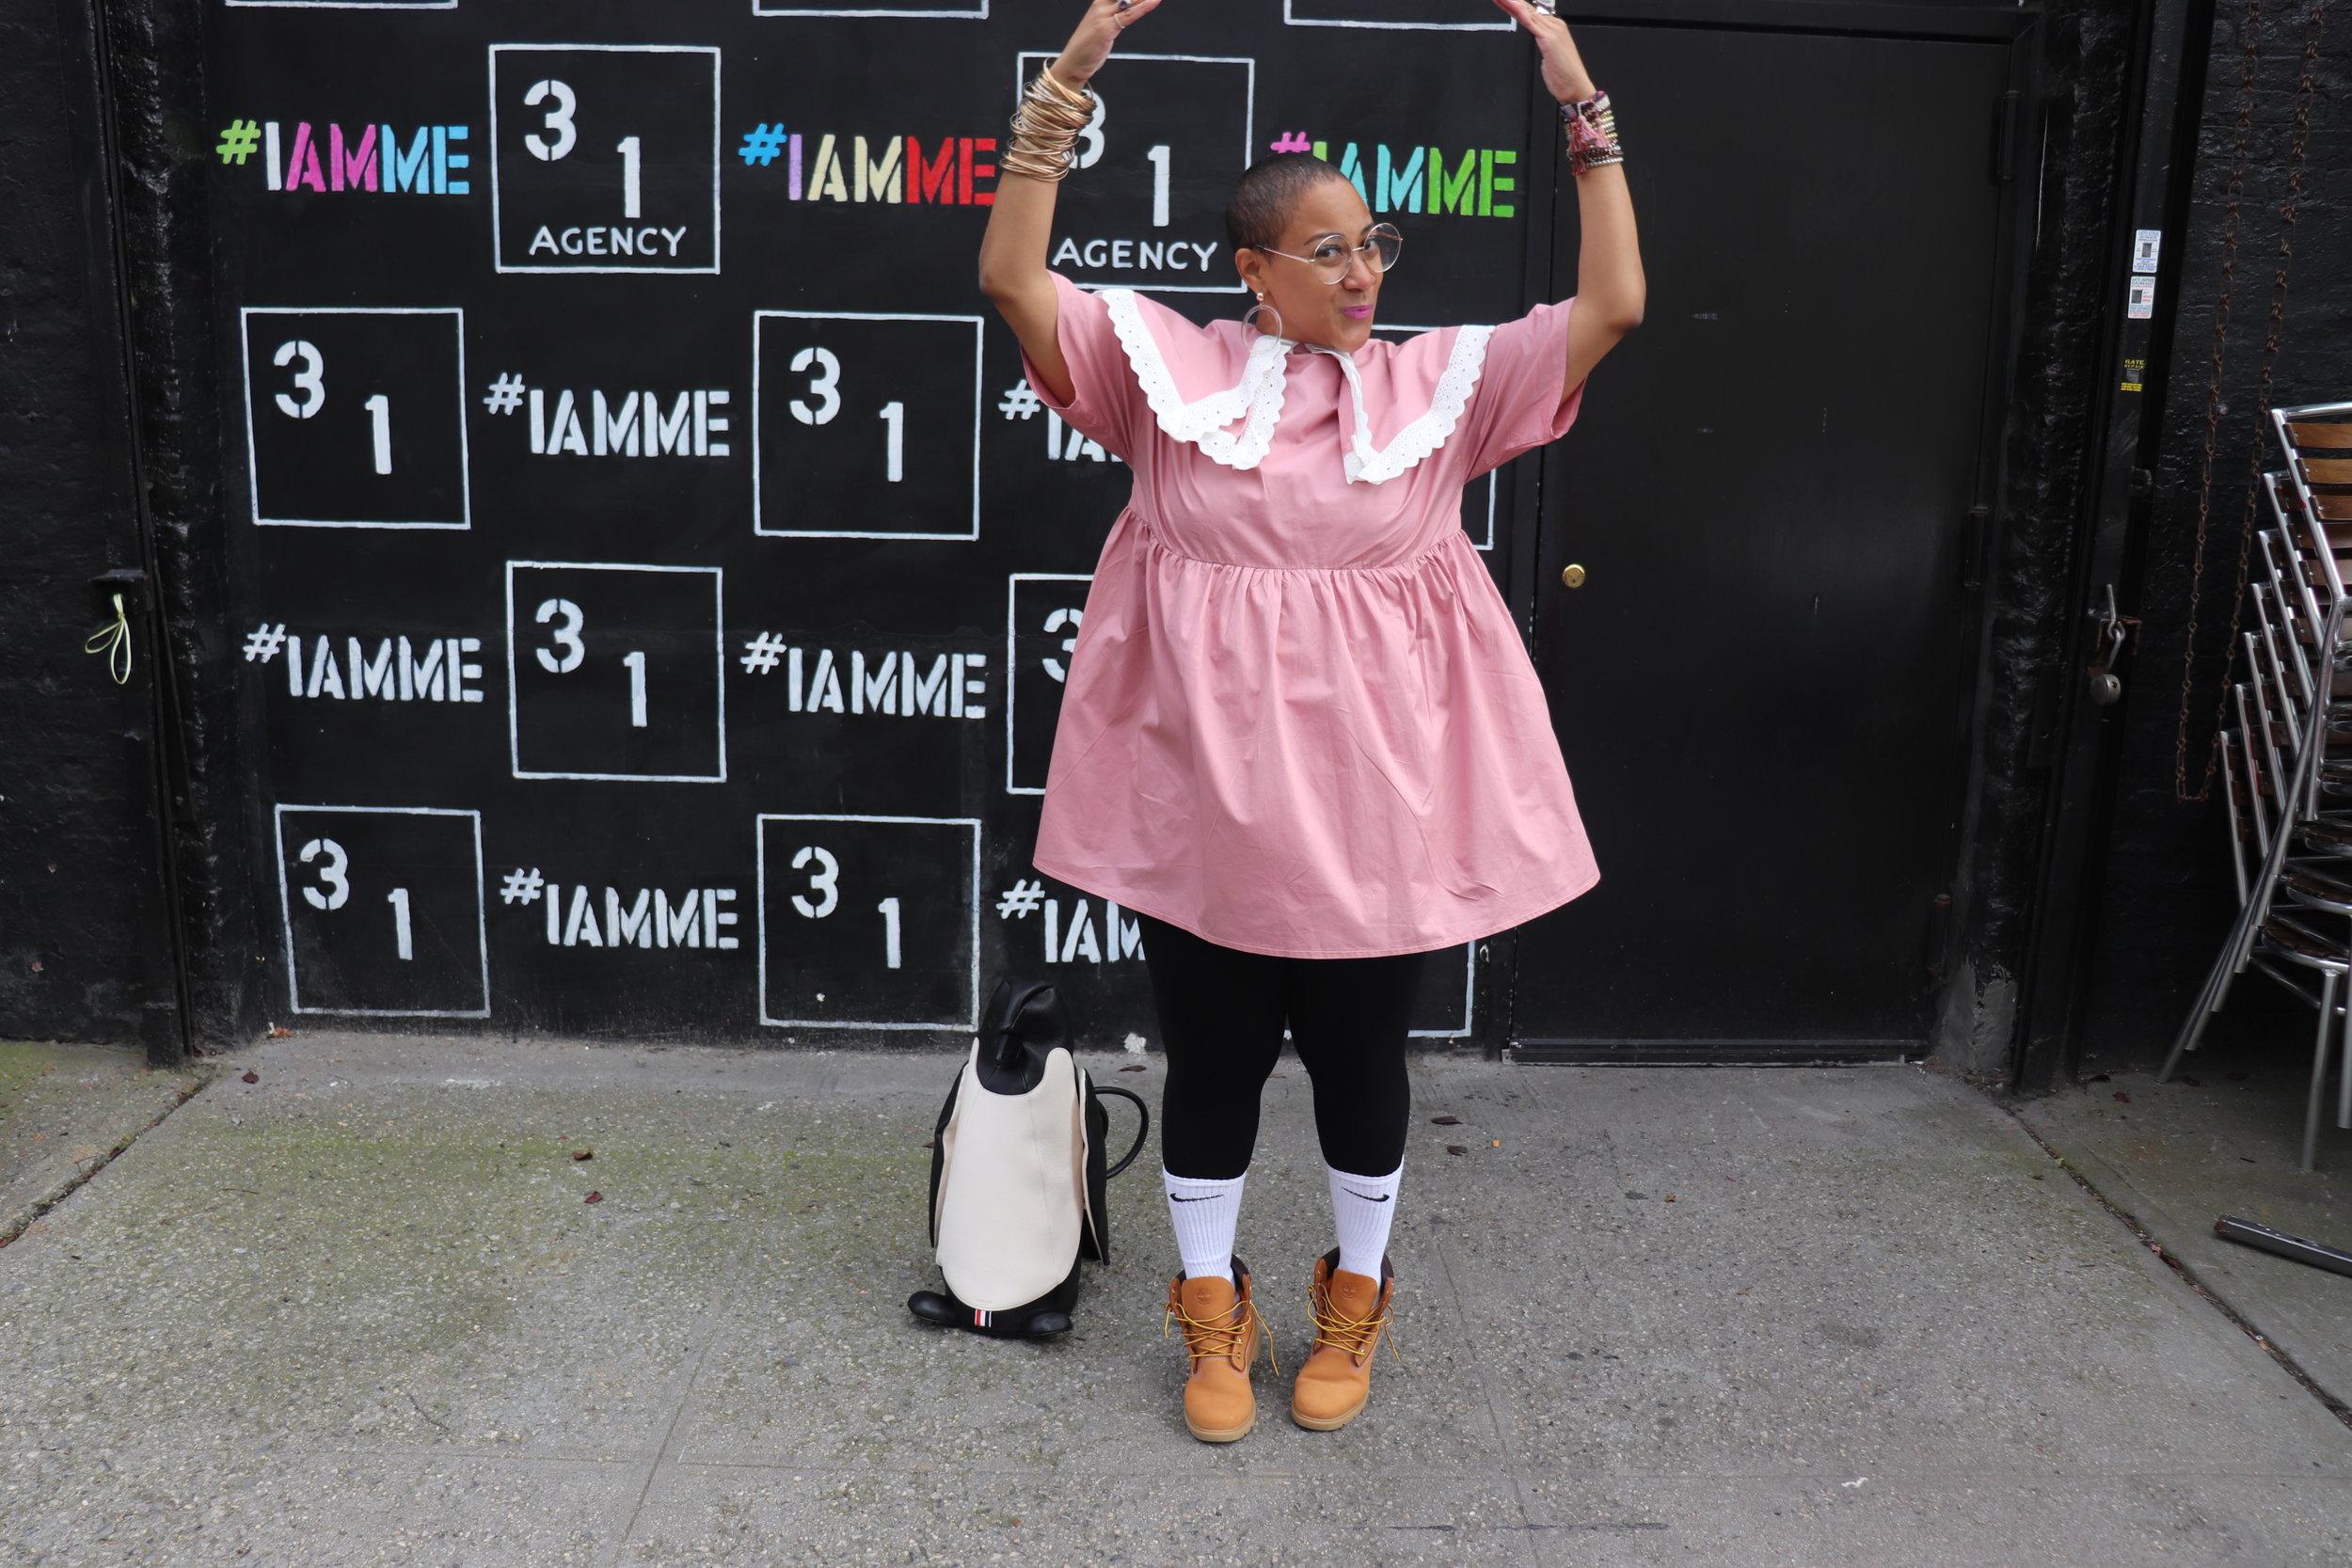 #IAMME Blog Post